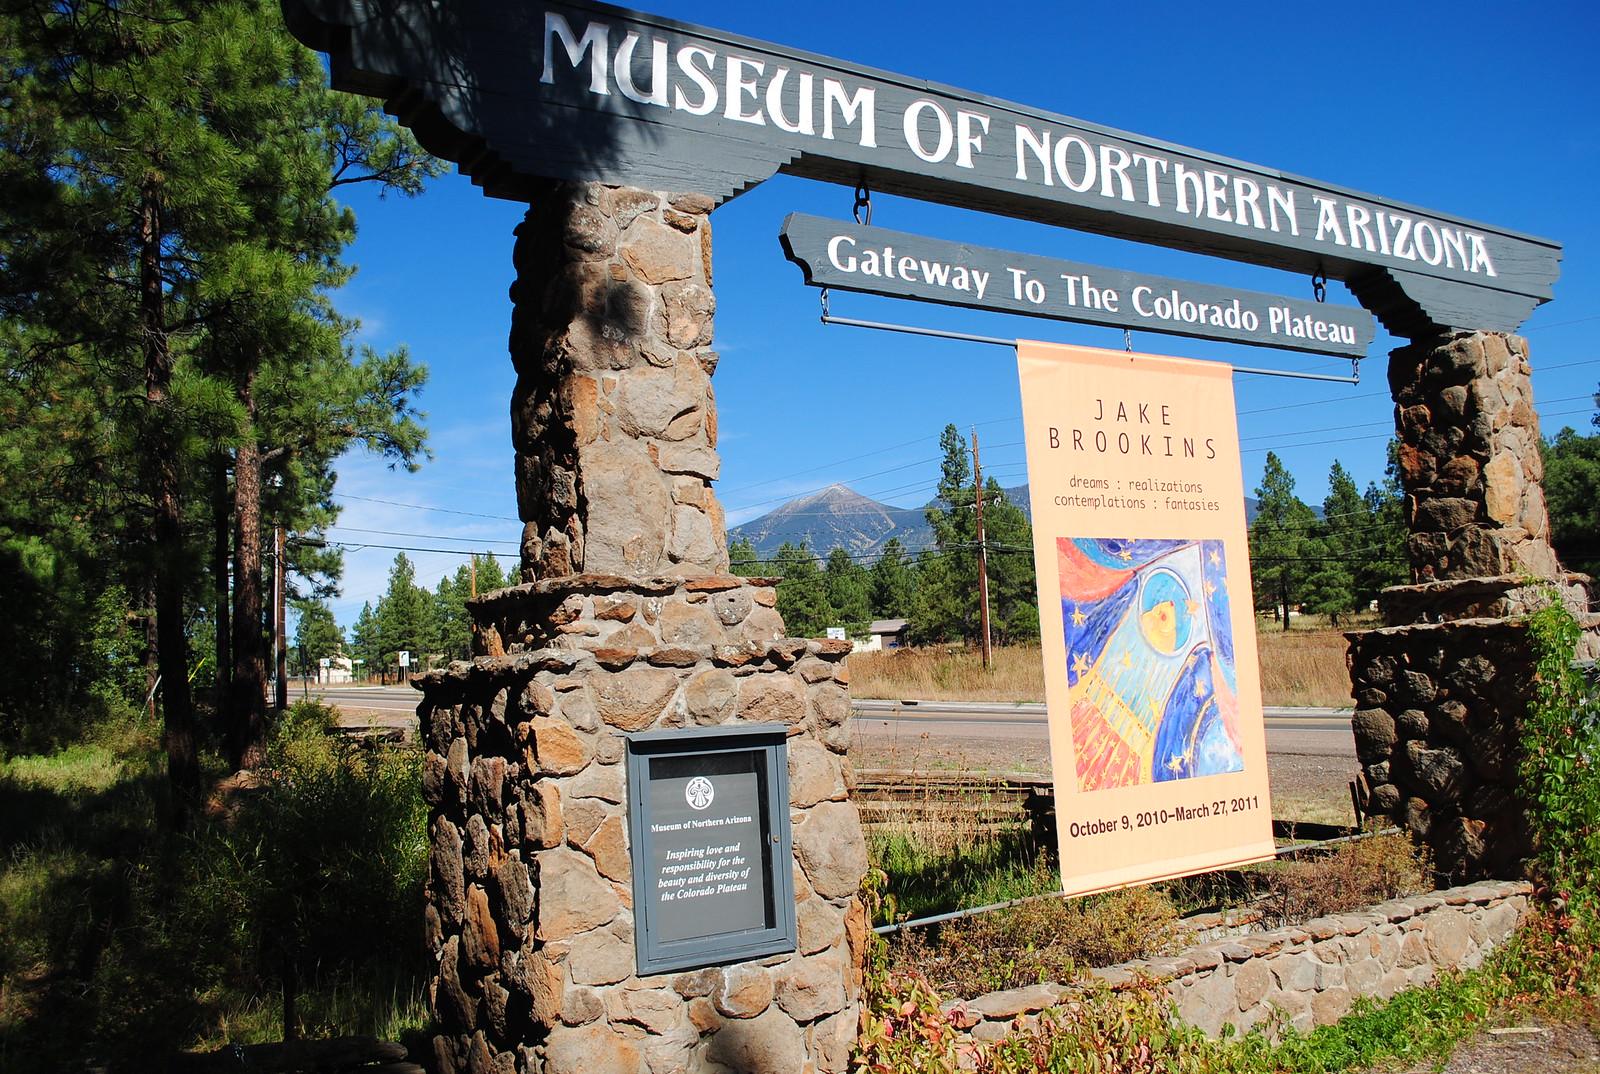 Flagstaff - Museum of Northern Arizona